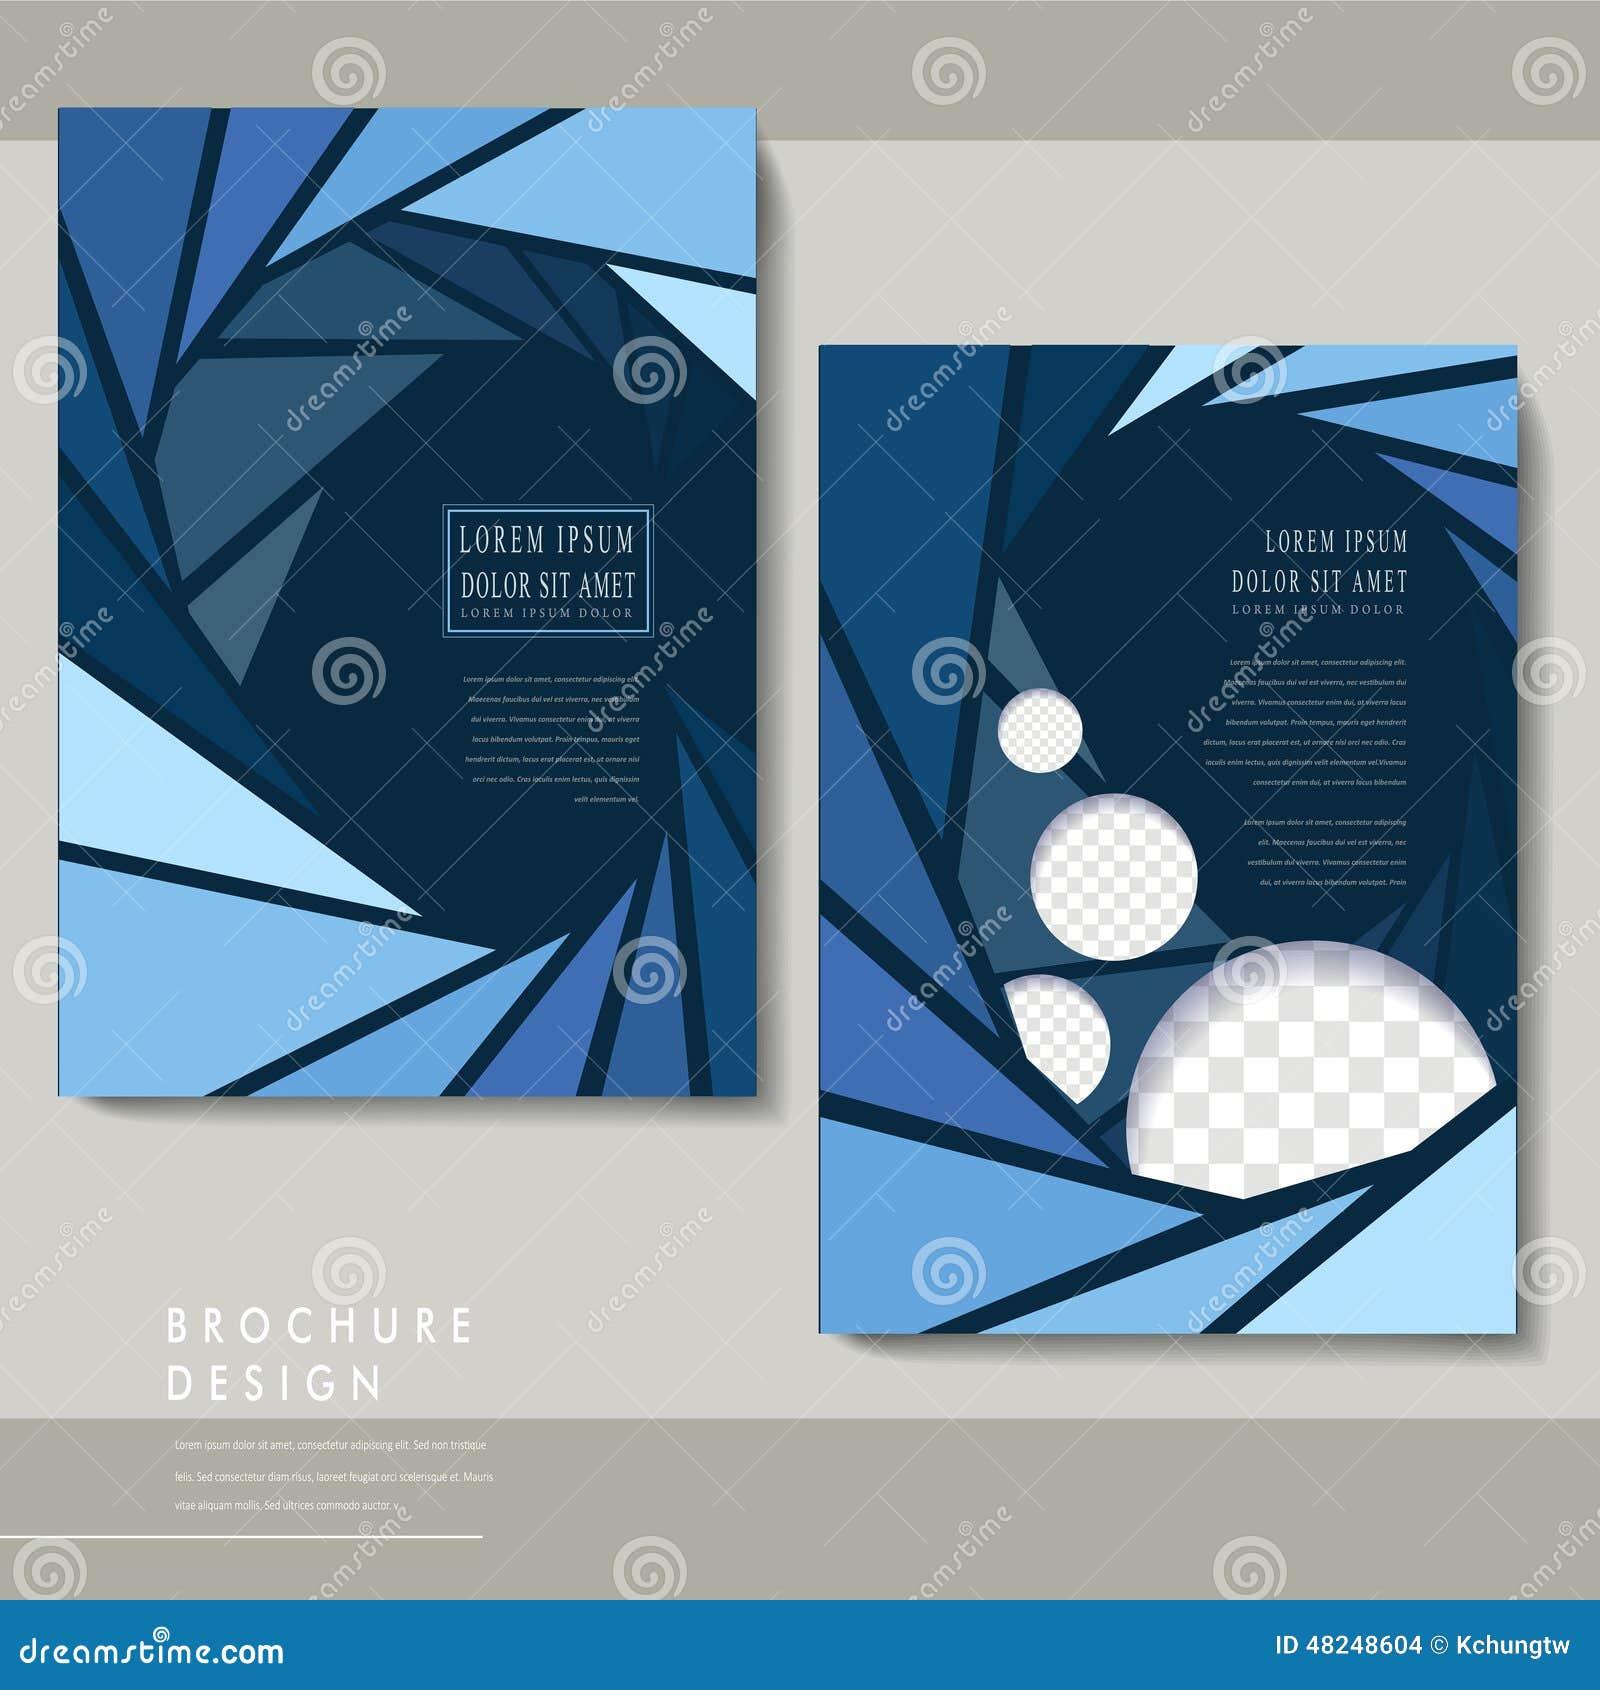 modern poster template set stock vector image of decor 48248604. Black Bedroom Furniture Sets. Home Design Ideas